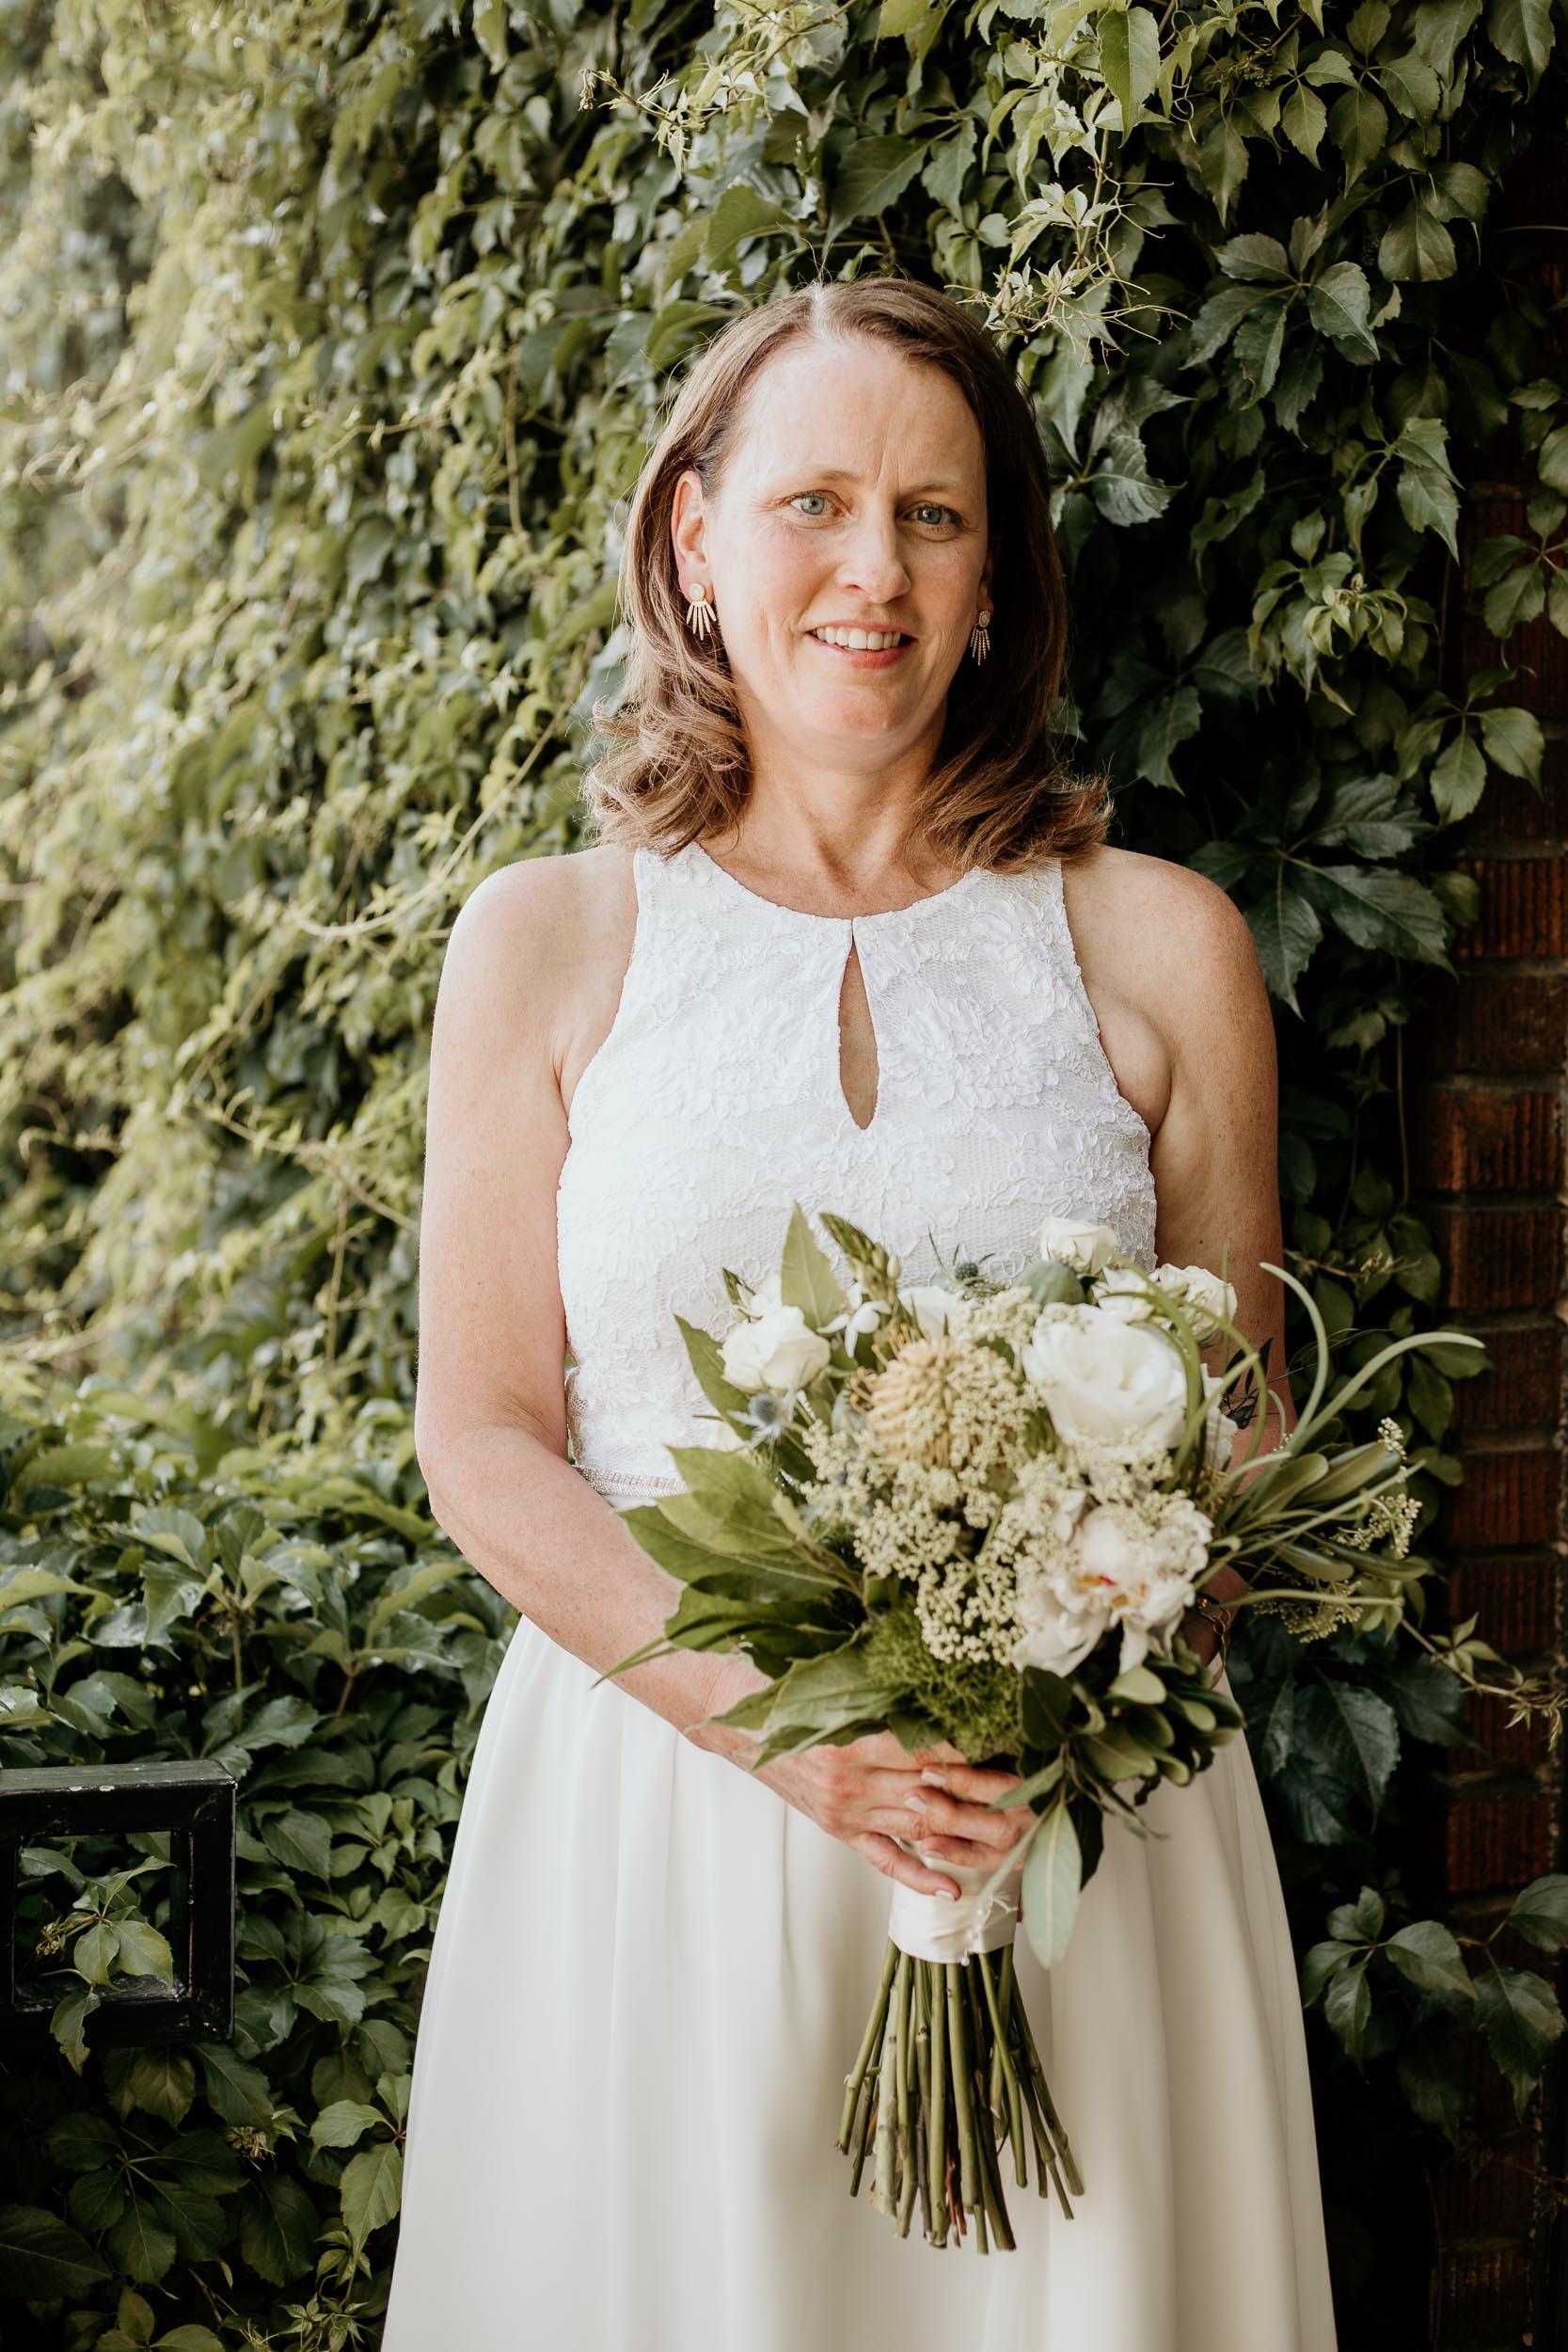 elopement-engagement-photographer-ottawa-4722.jpg